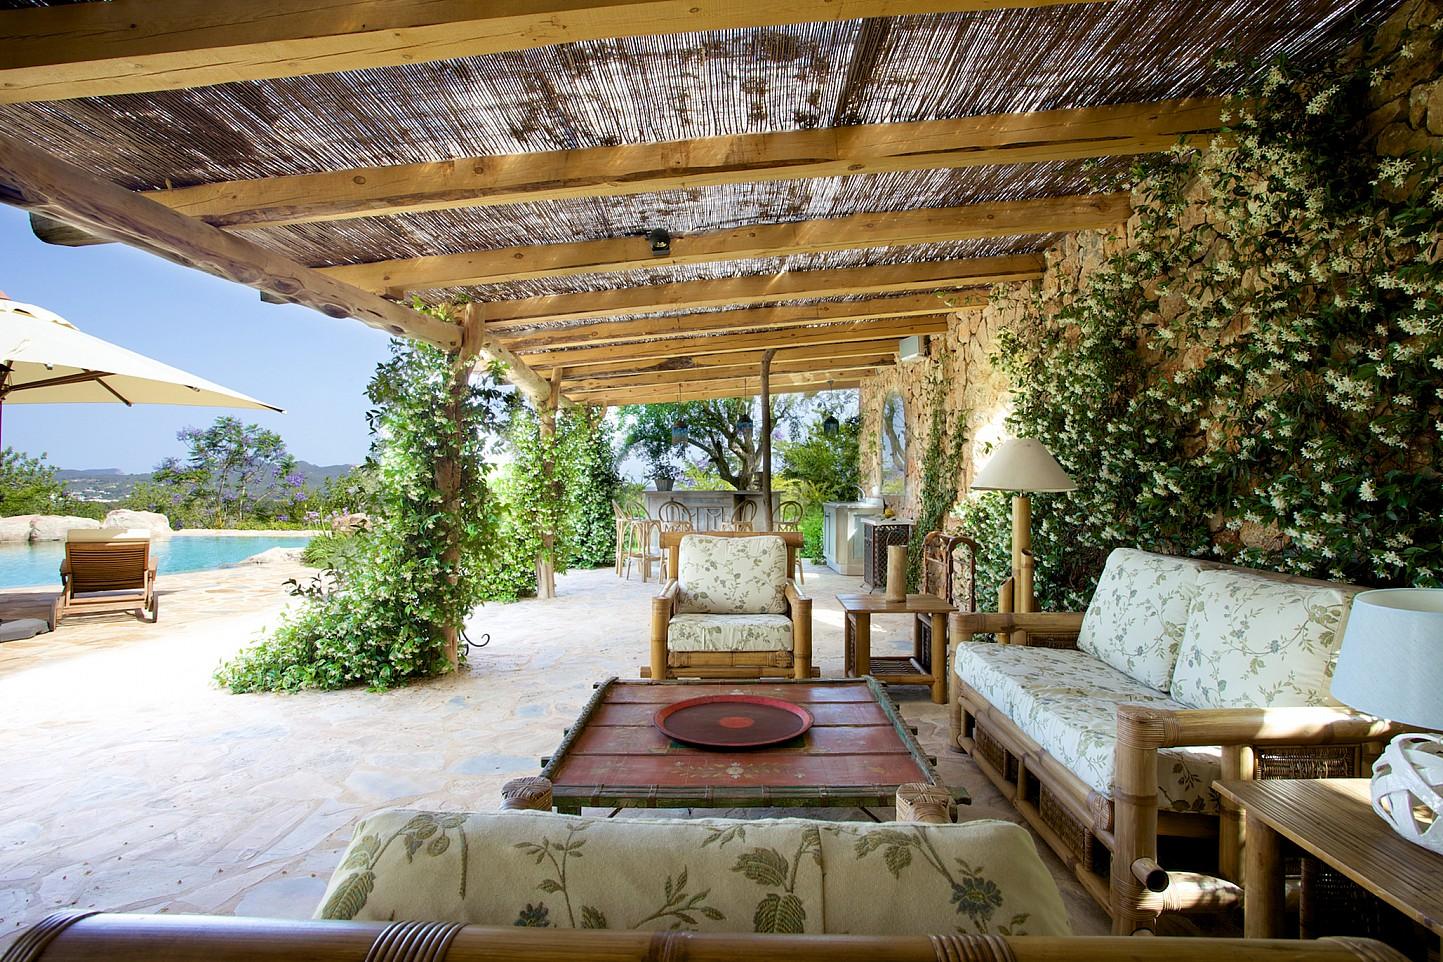 Zona de relax exterior cubierta por el porche